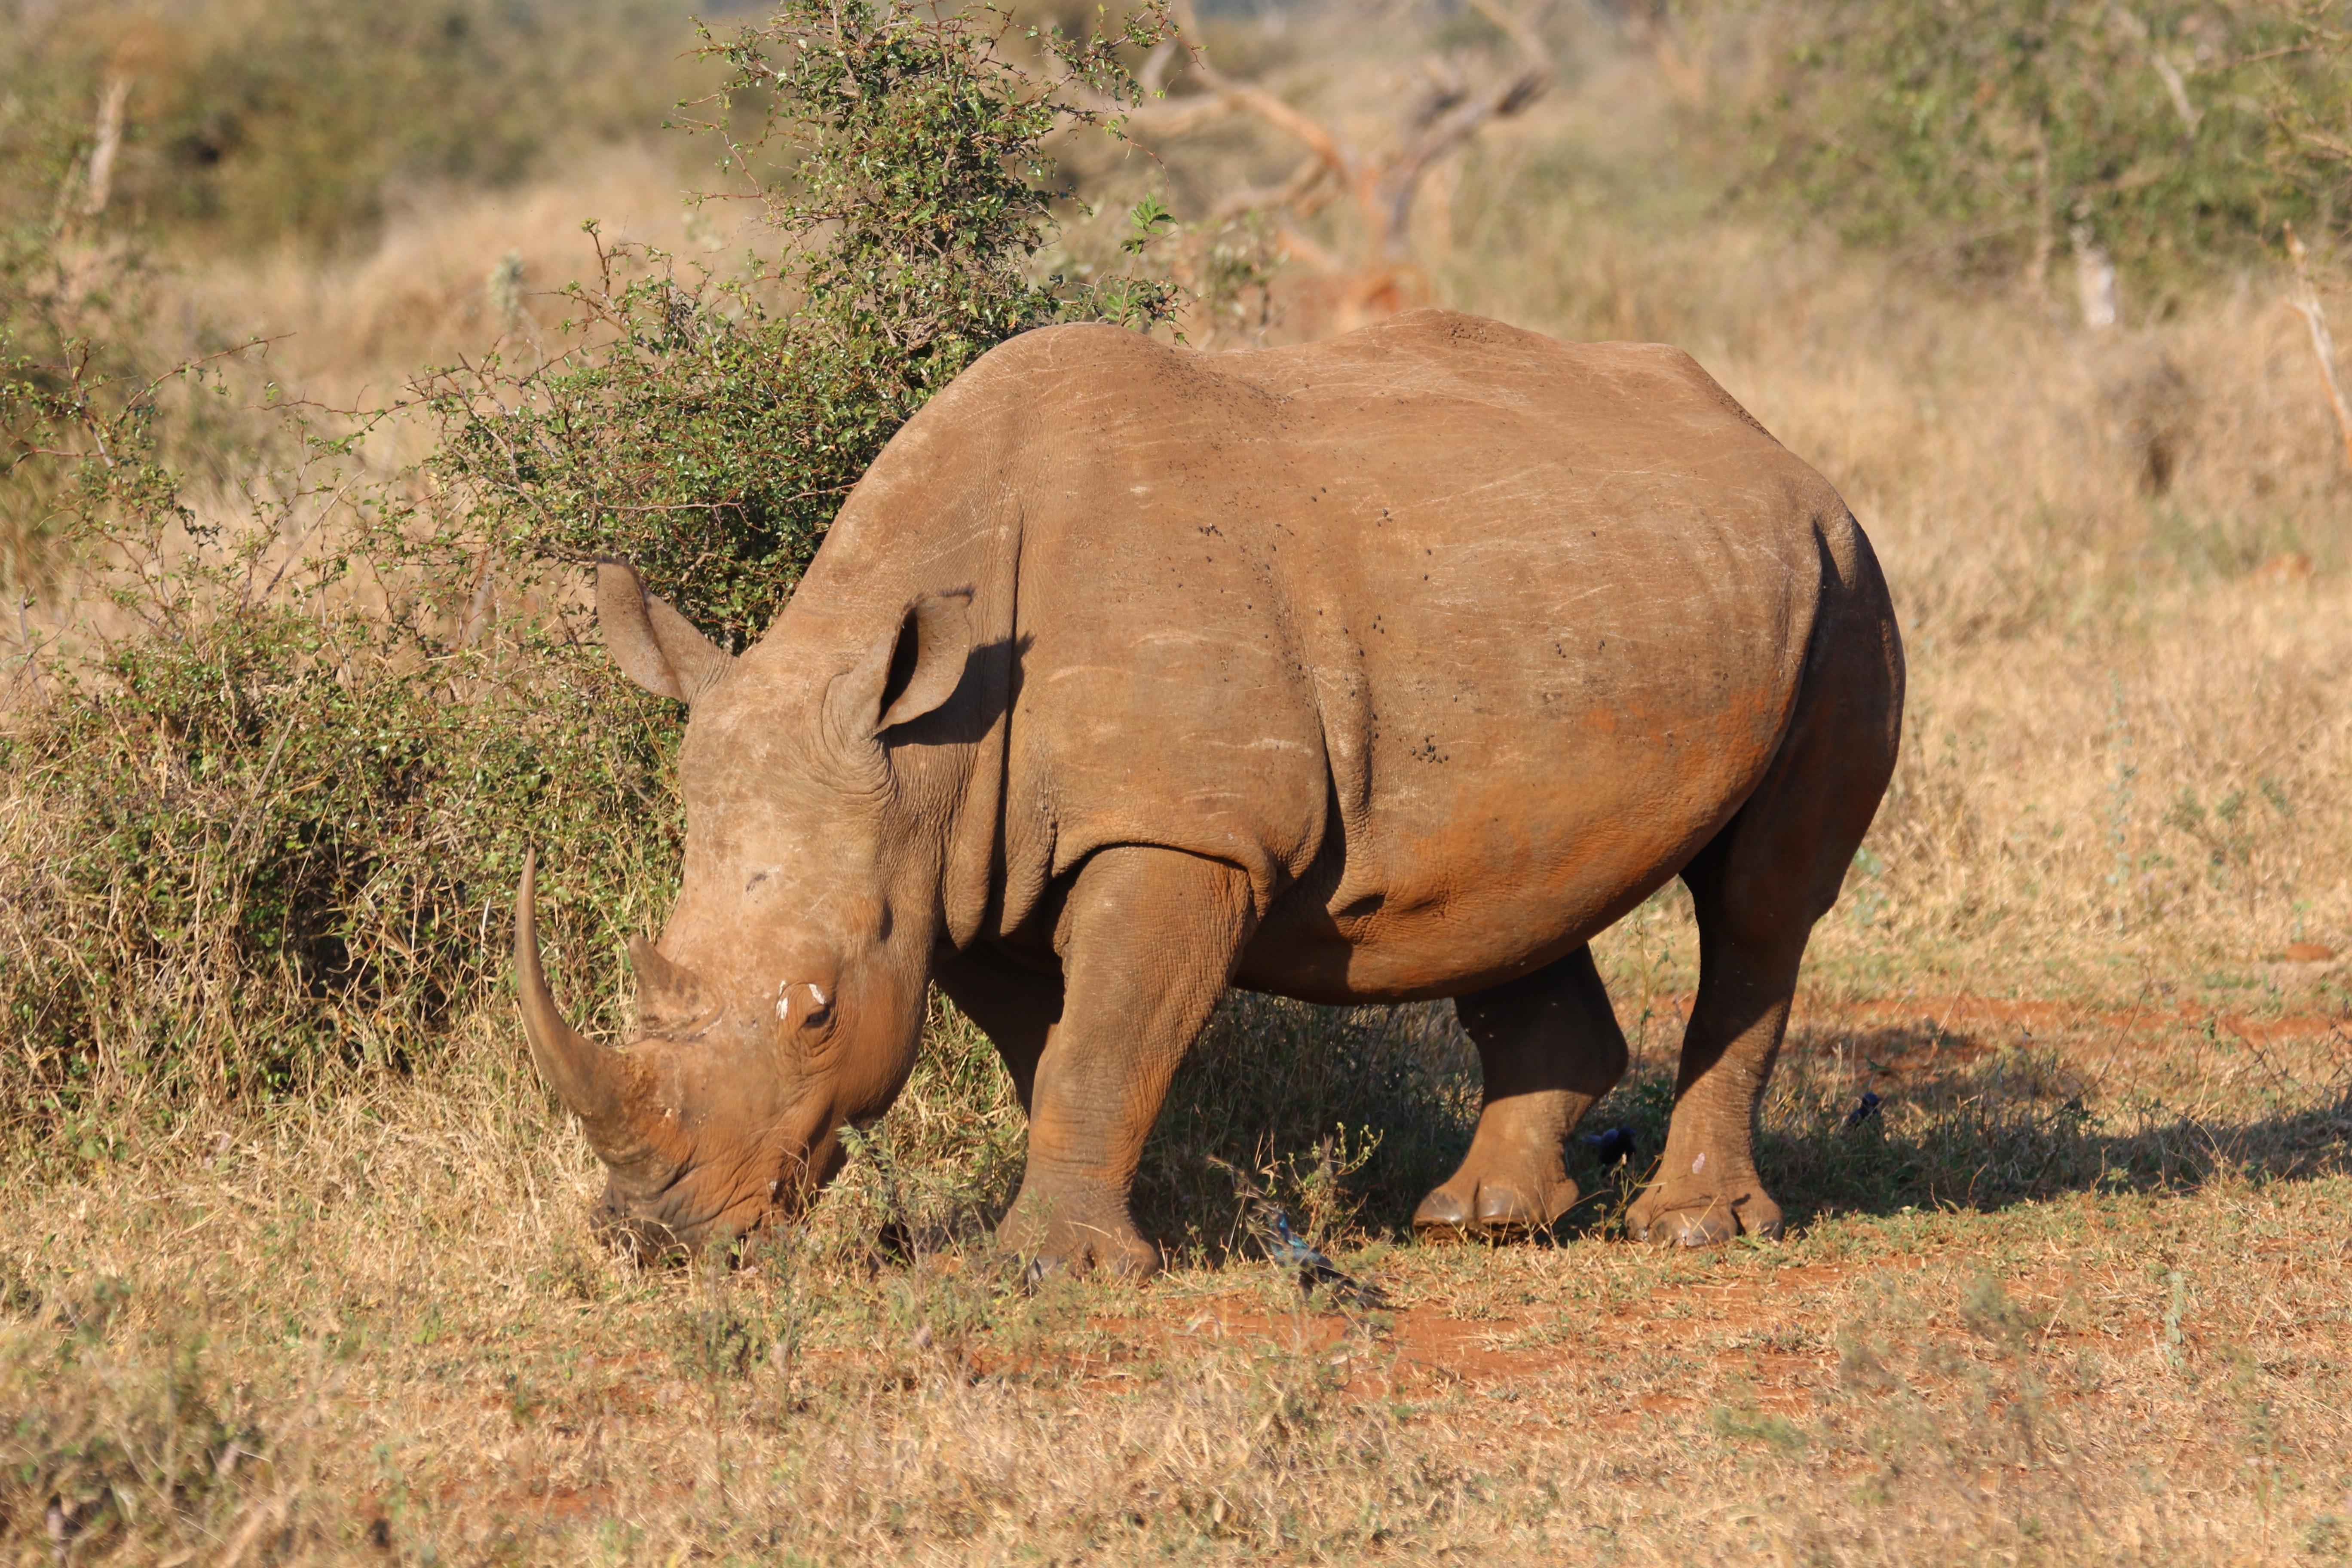 Gambar Afrika Hewan Biadab Semak Makanan Gajah Terancam